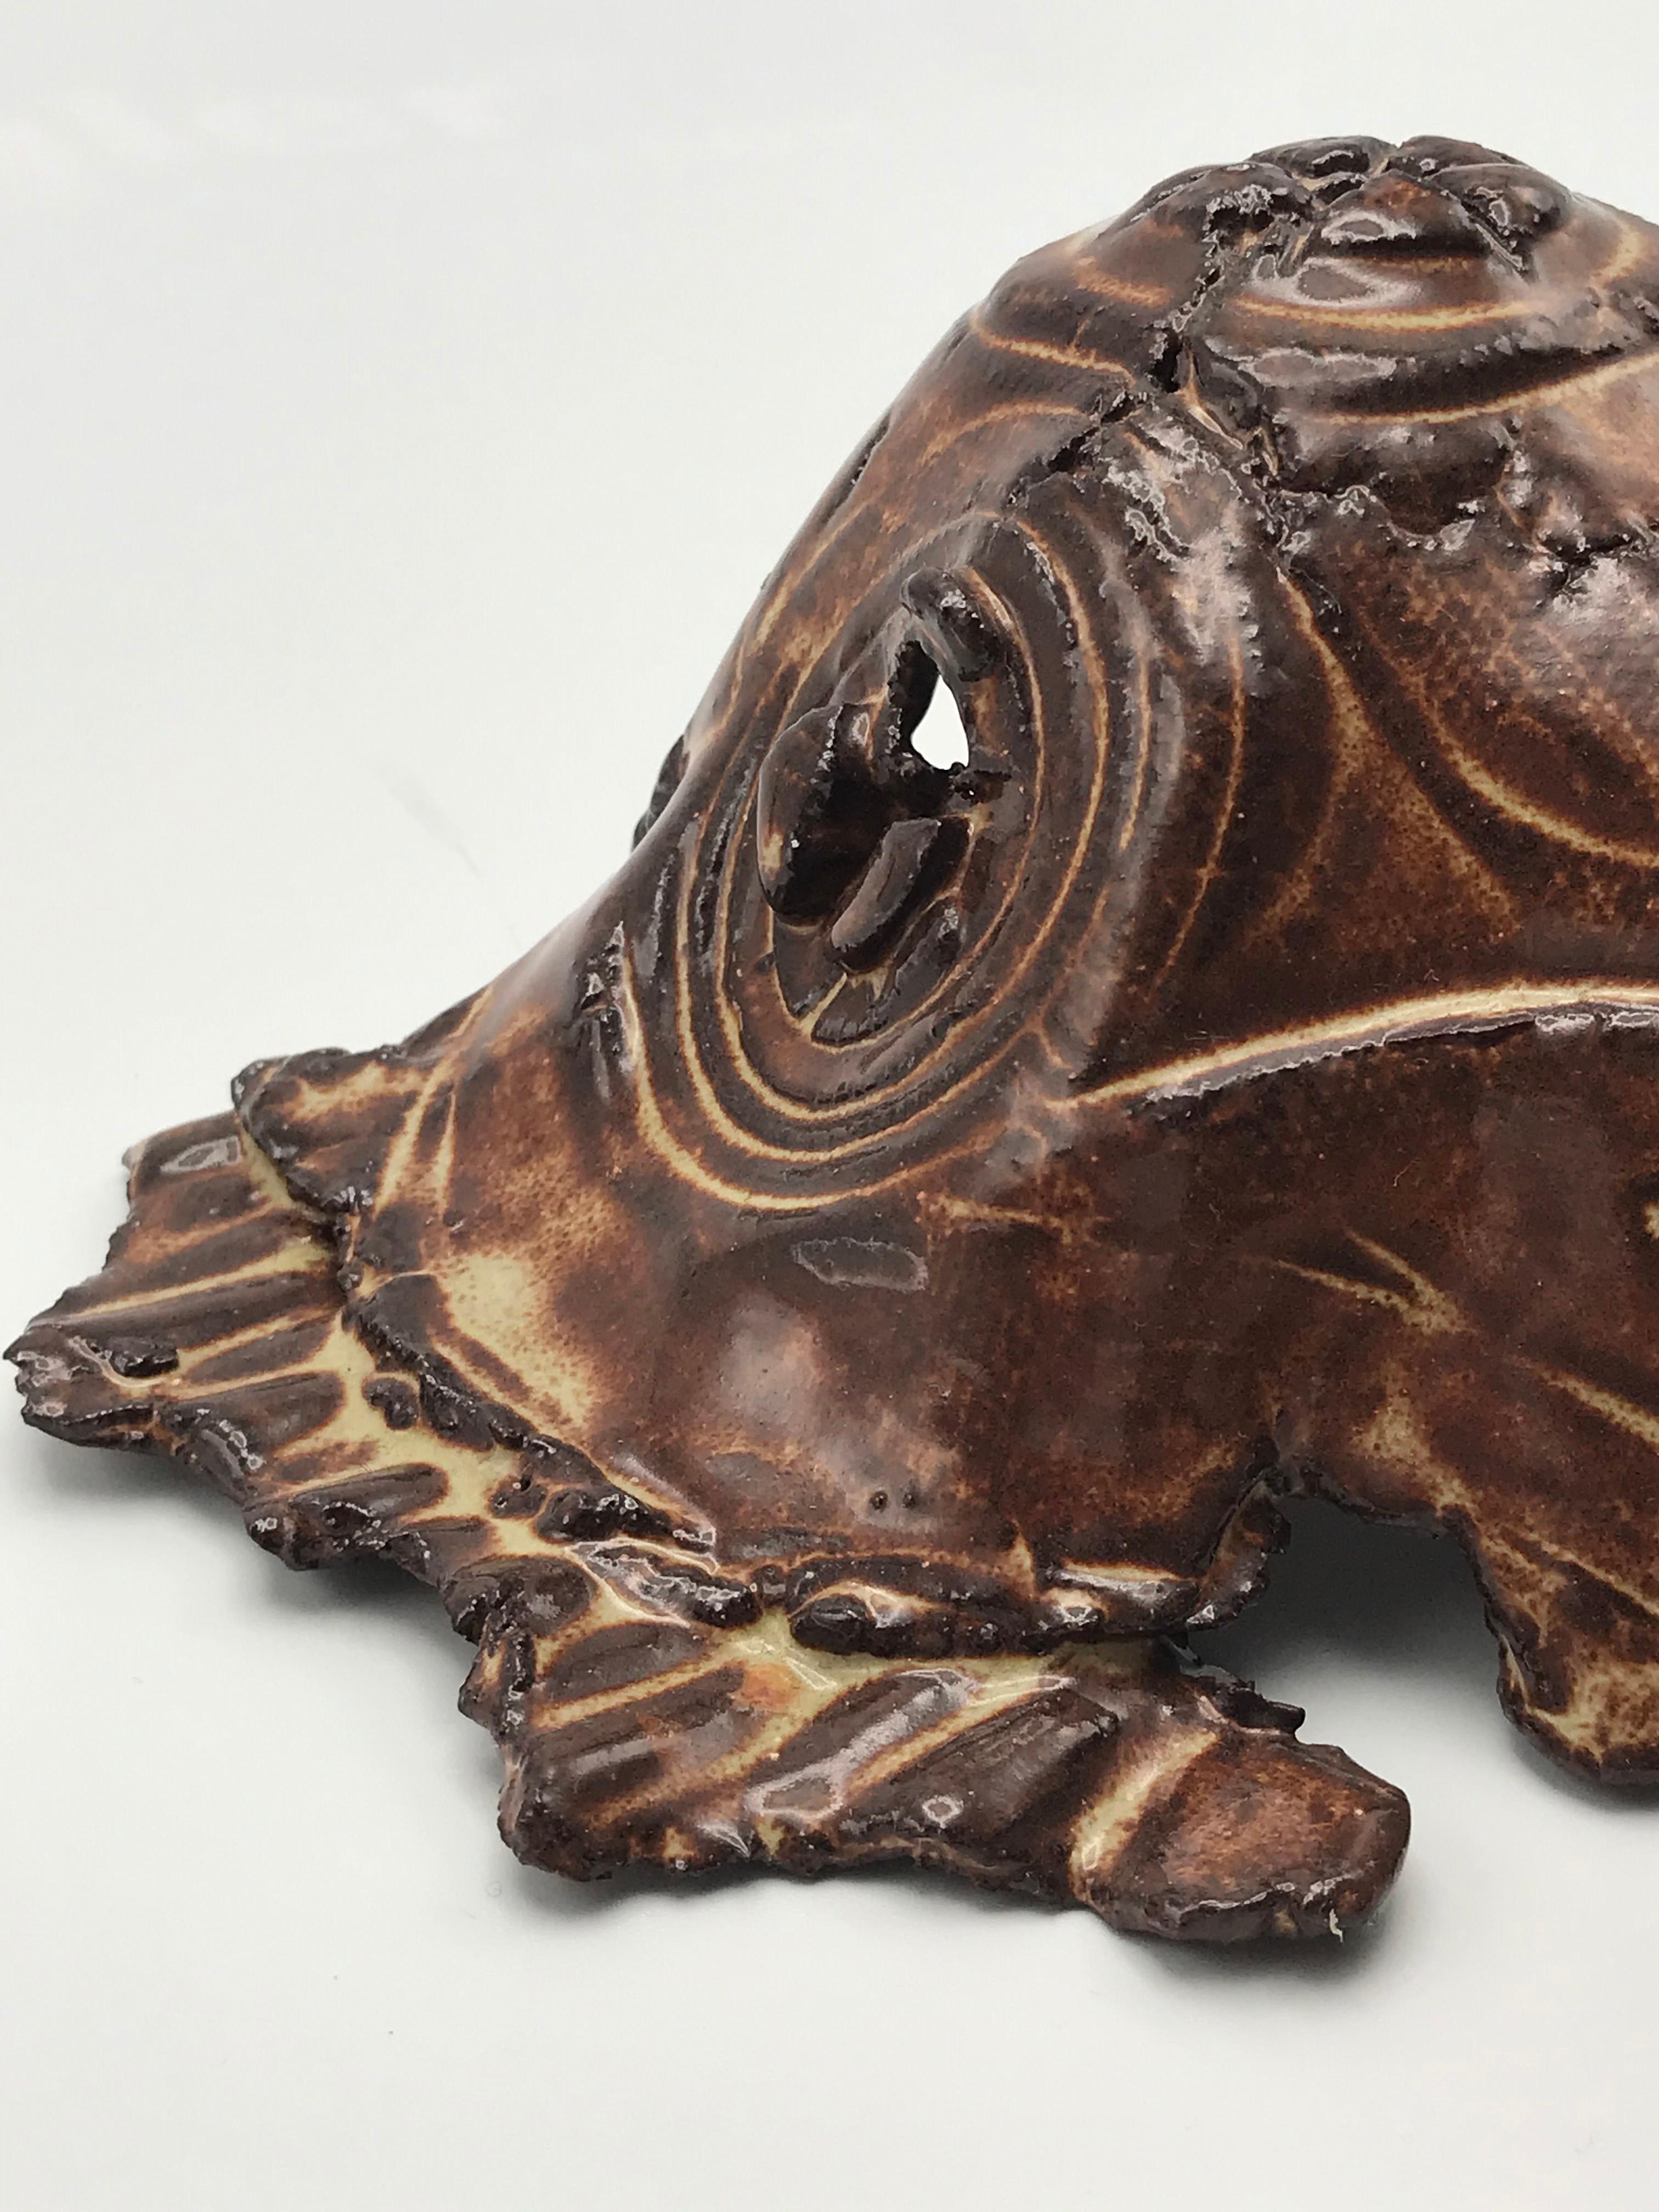 Ceramic Mask (Brown) -  5.5 x 6.5 - Ceramic and Brown, Glossy Glaze, 2019